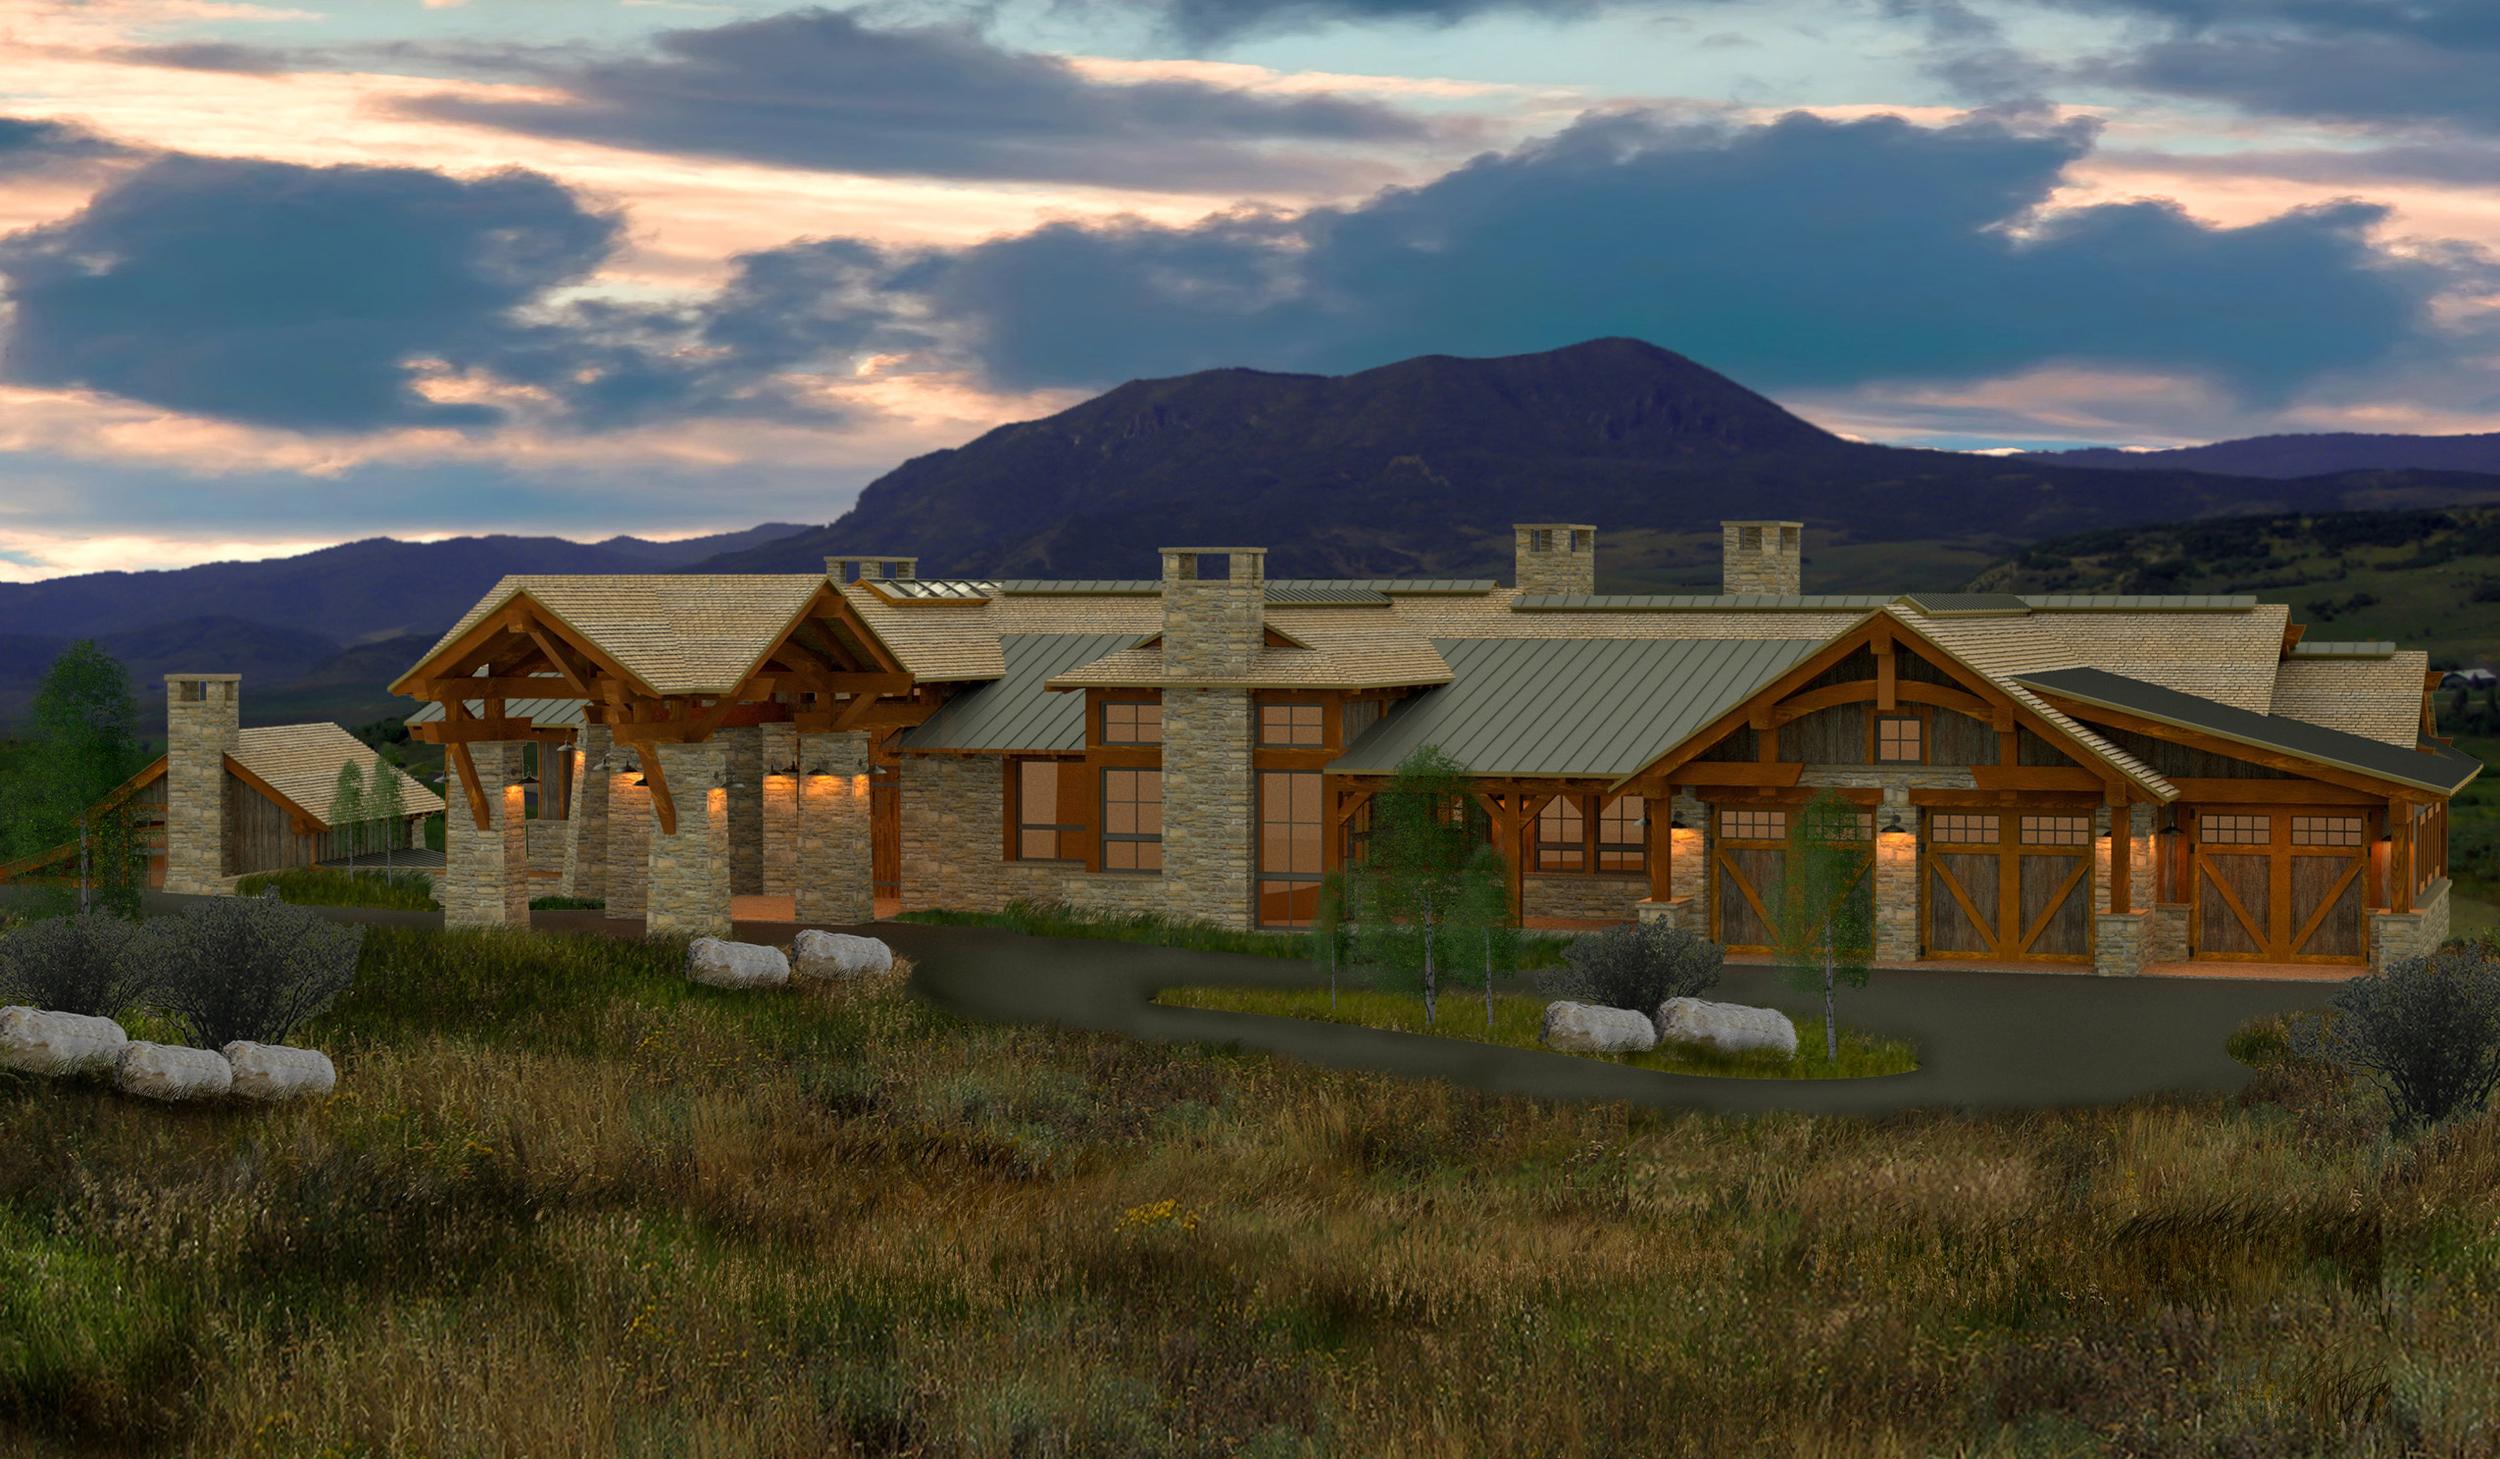 Colorado mountain ranch sustainable architect - 08.jpg